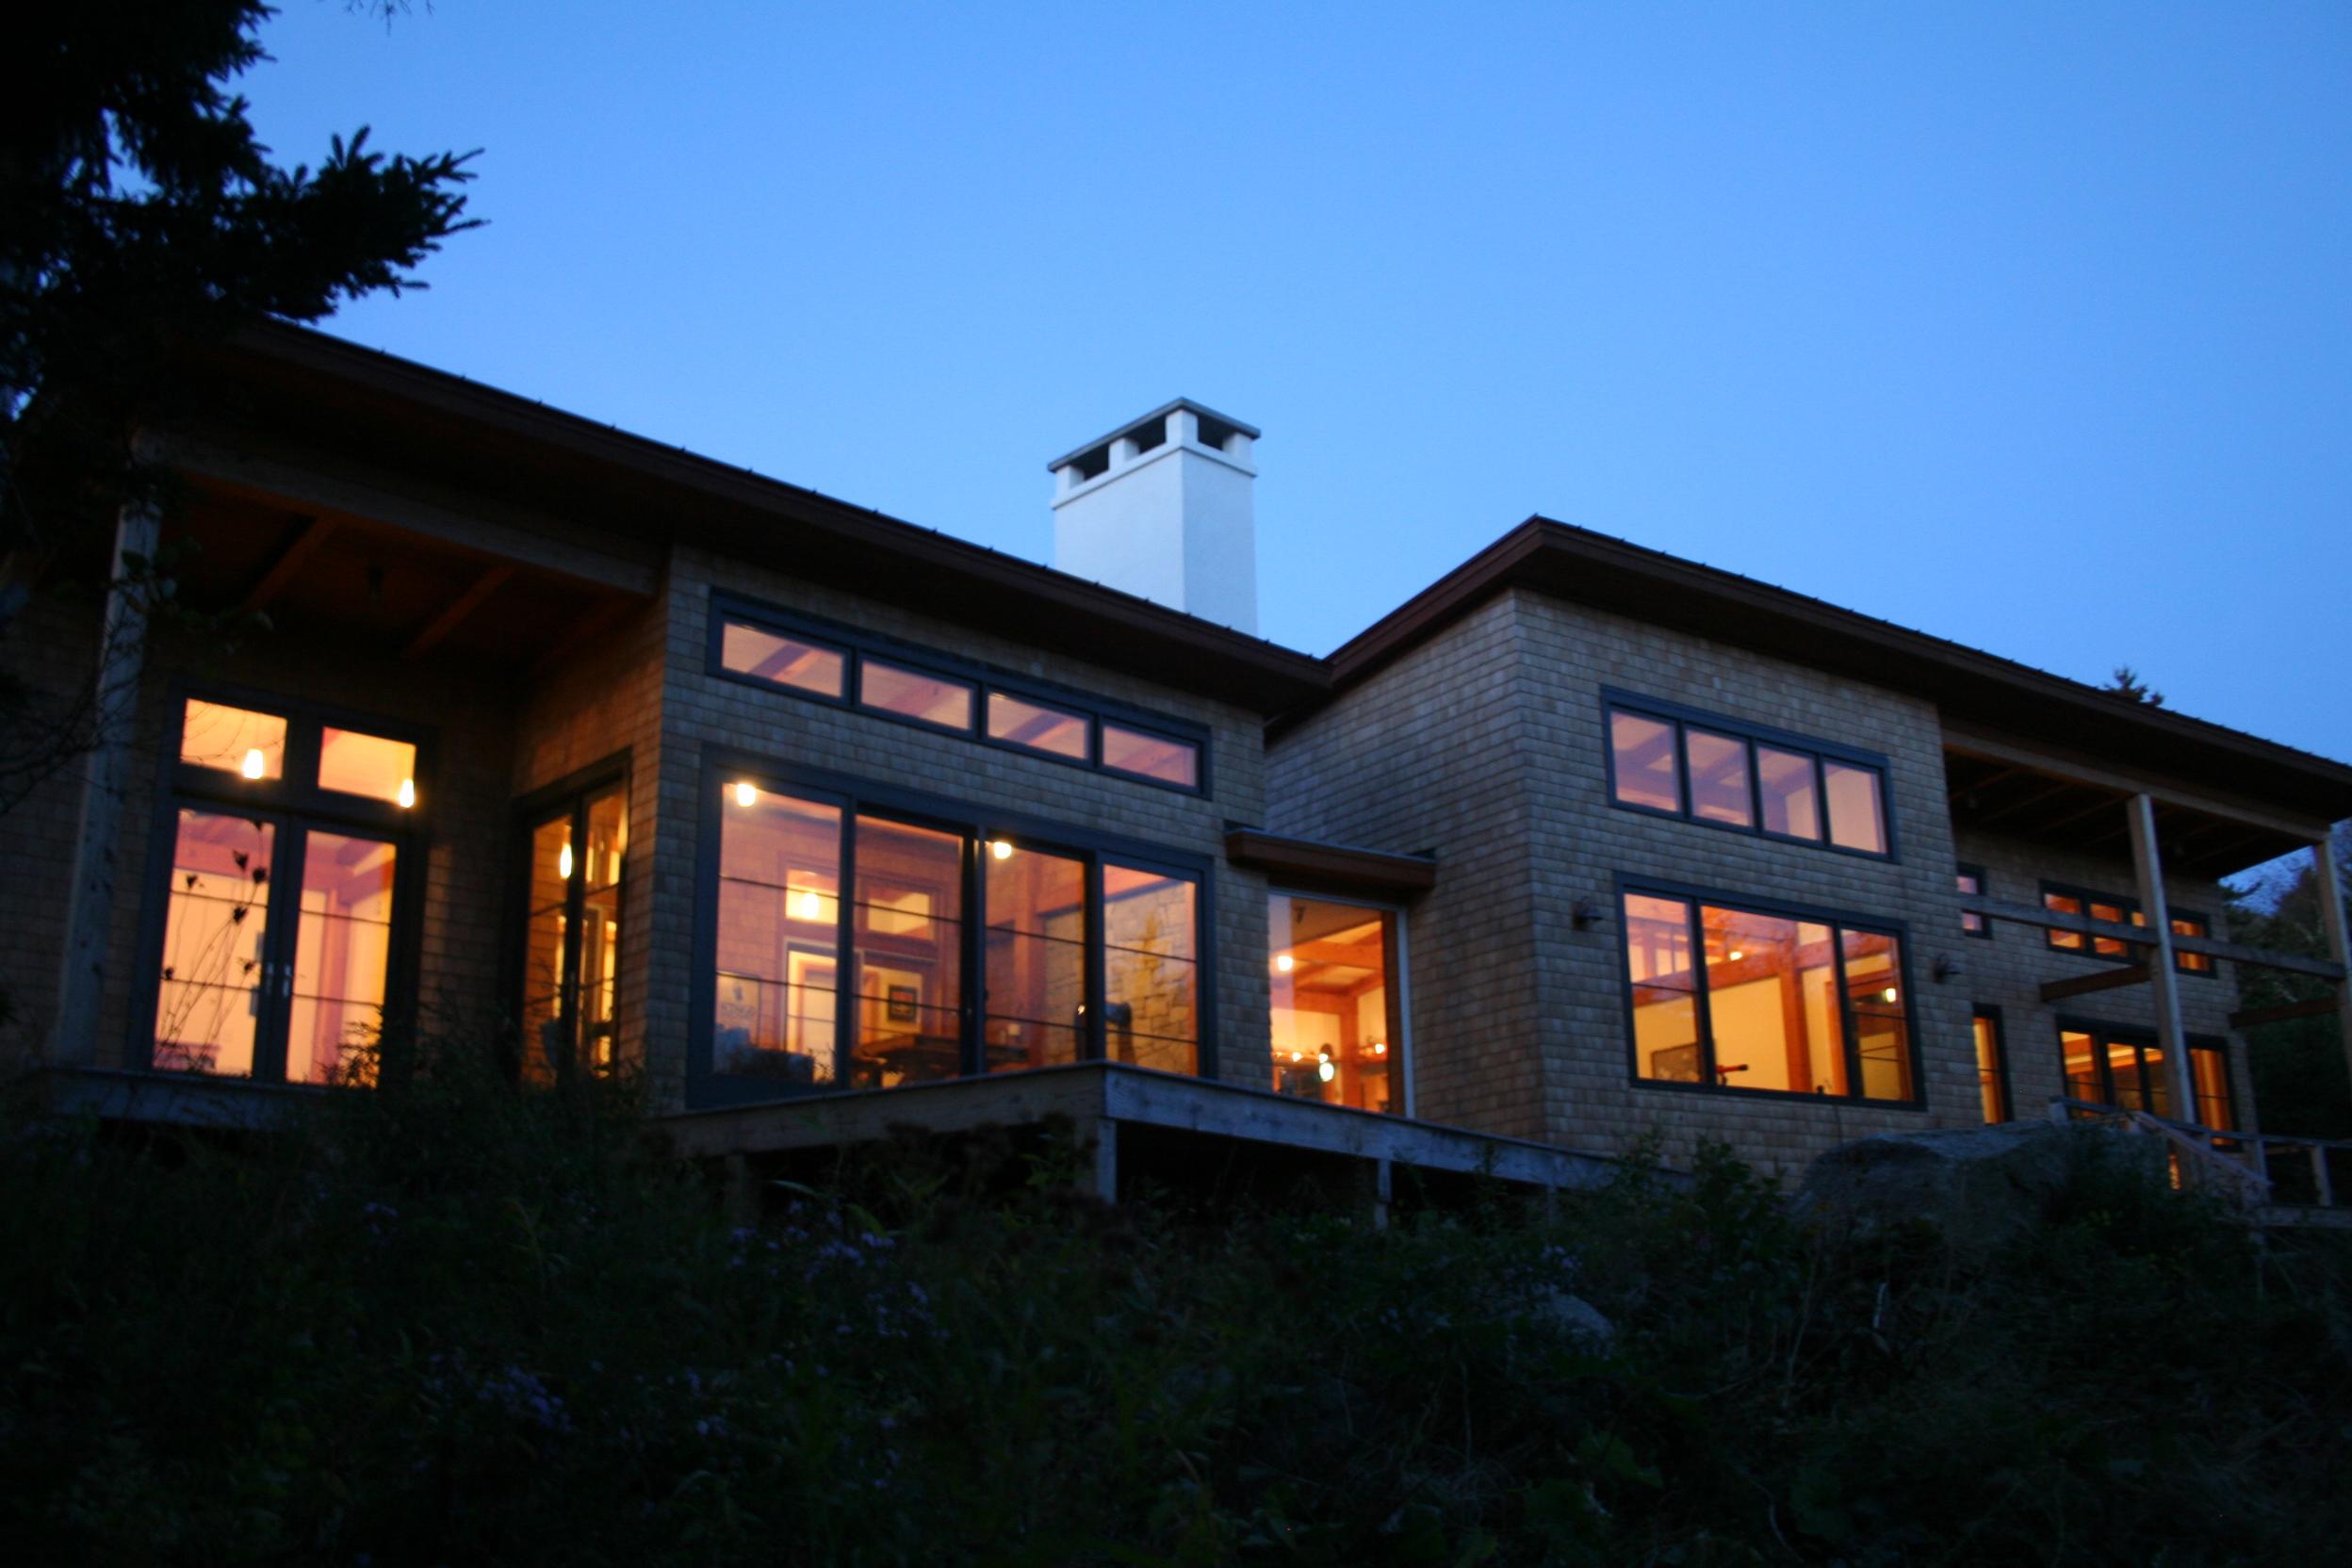 Architect: Dave Johnson